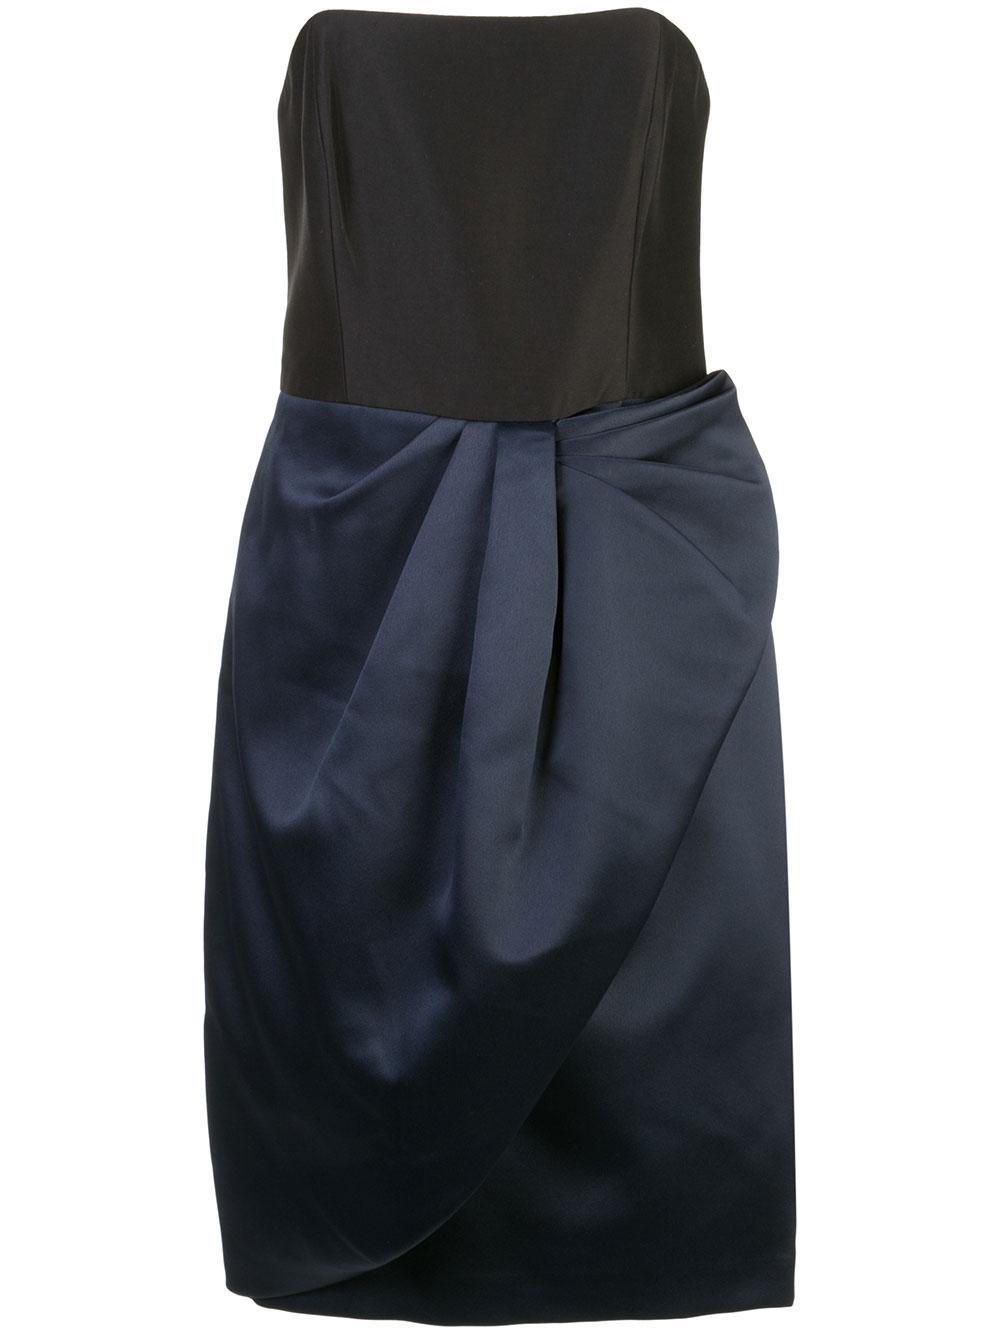 Bow Drape Bonded Satin Dress